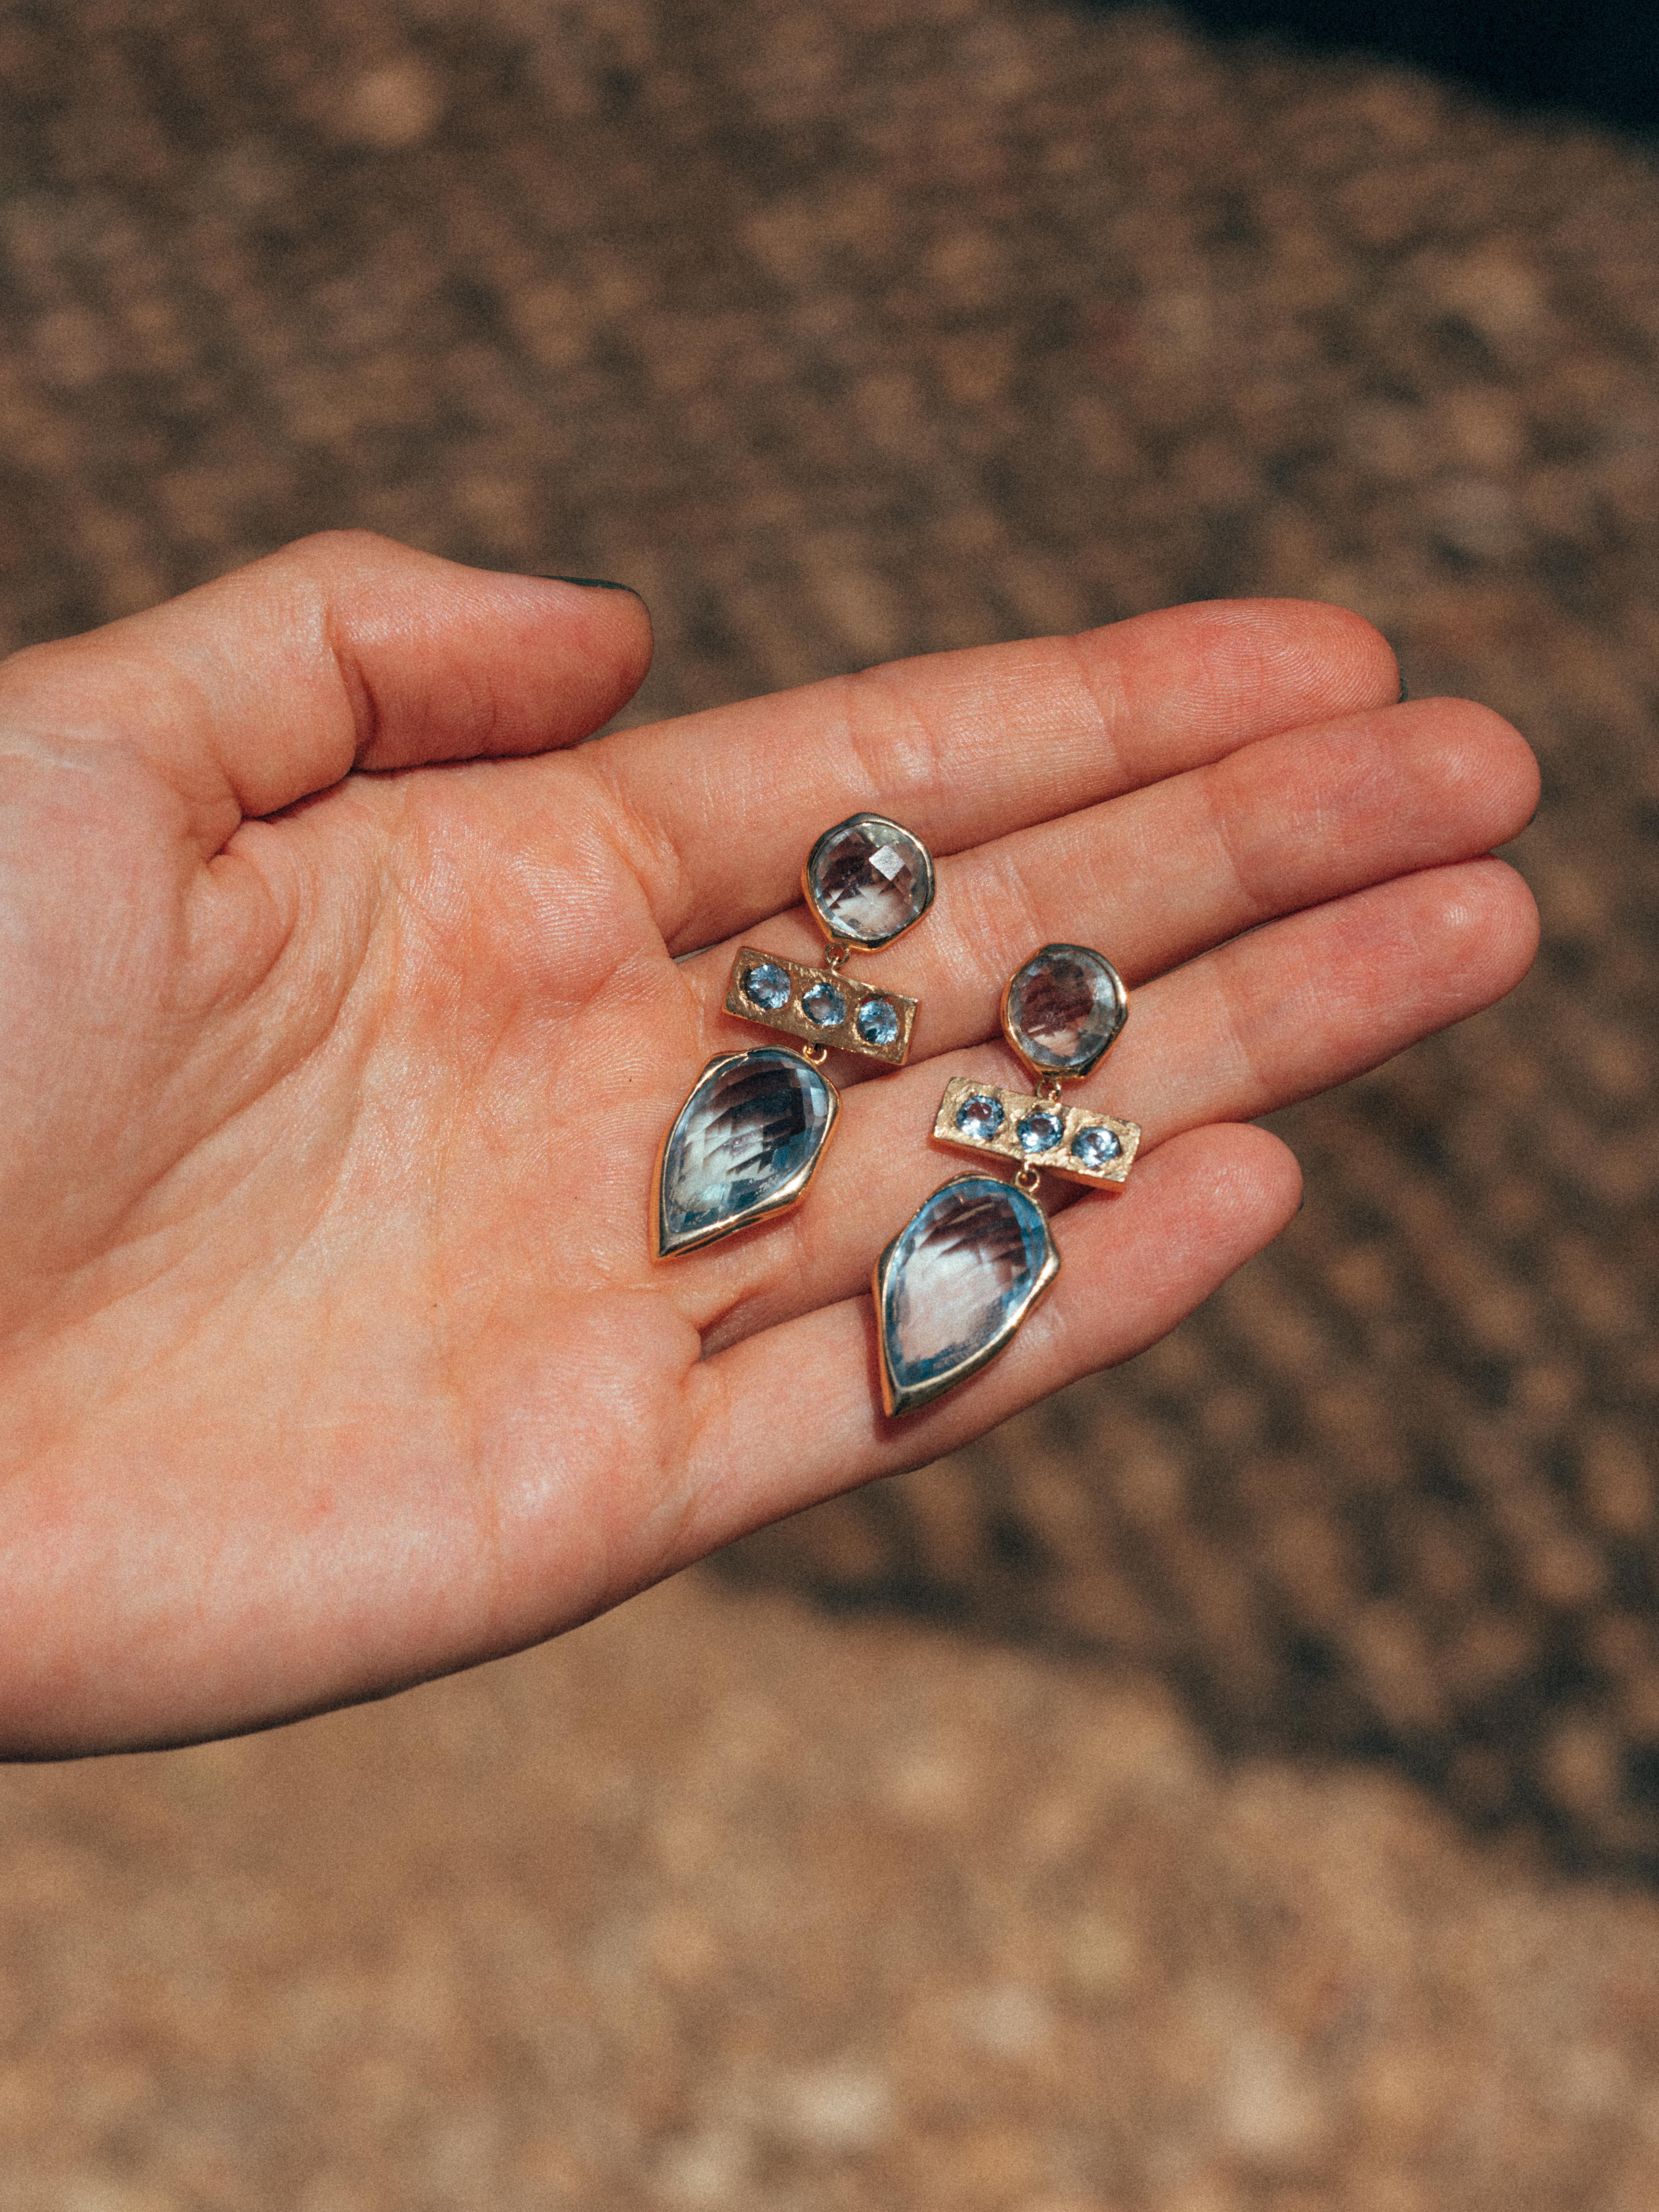 pendientes-nuria-val-frecklesnur-jordi-rosich-5